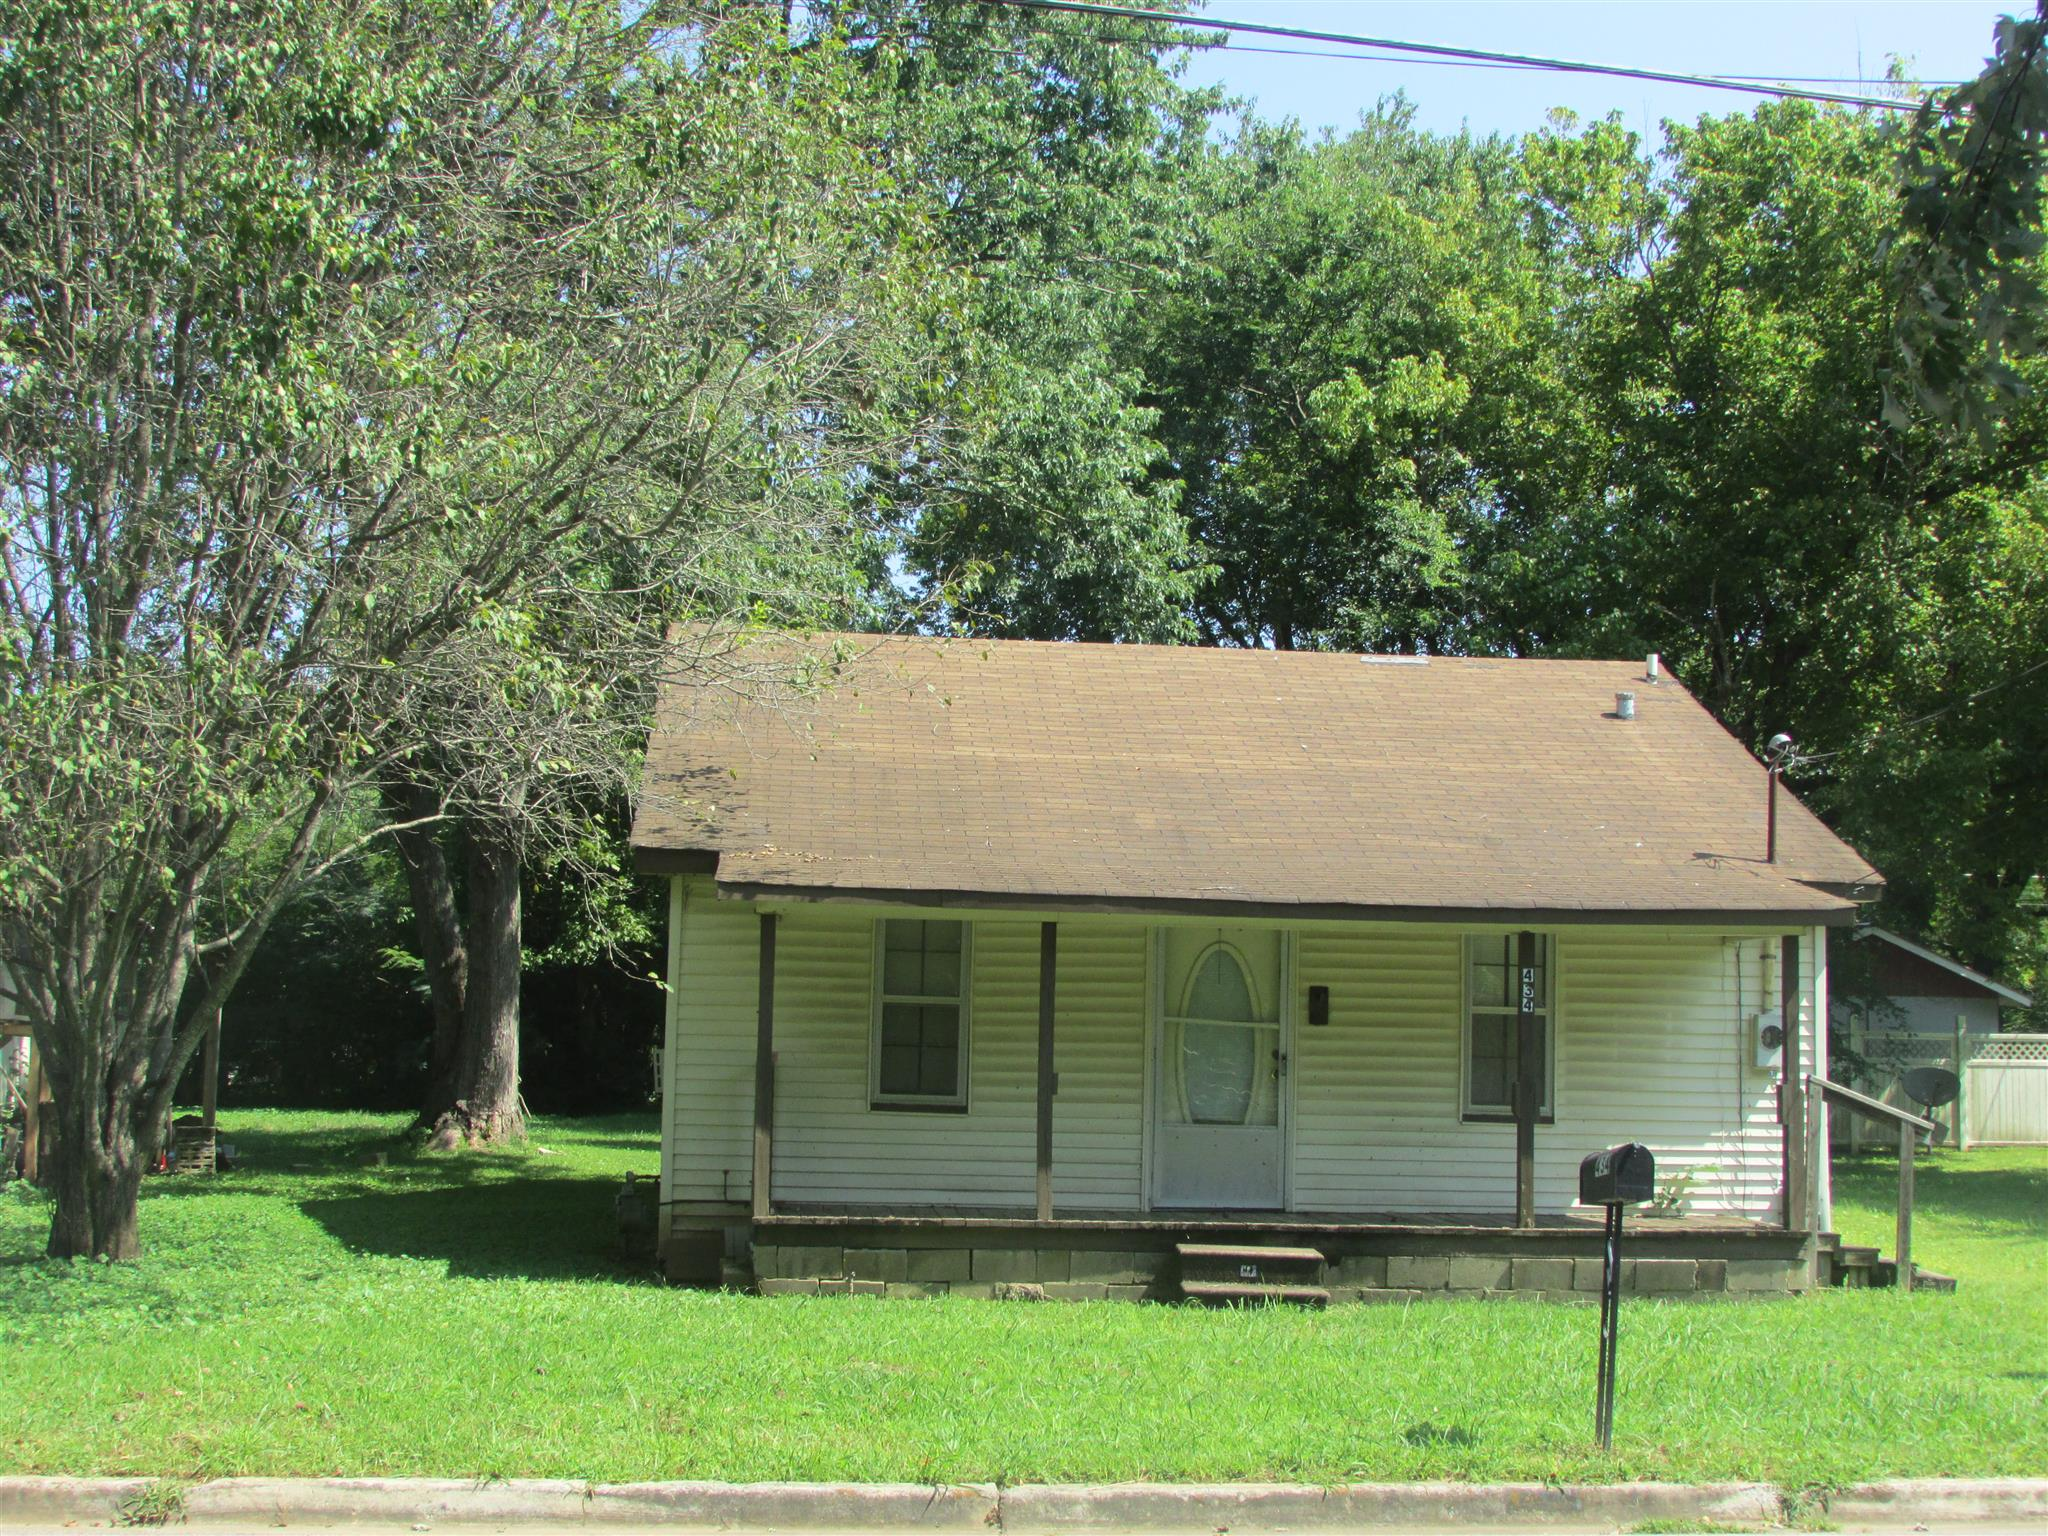 434 6Th St, E, Lawrenceburg, TN 38464 - Lawrenceburg, TN real estate listing